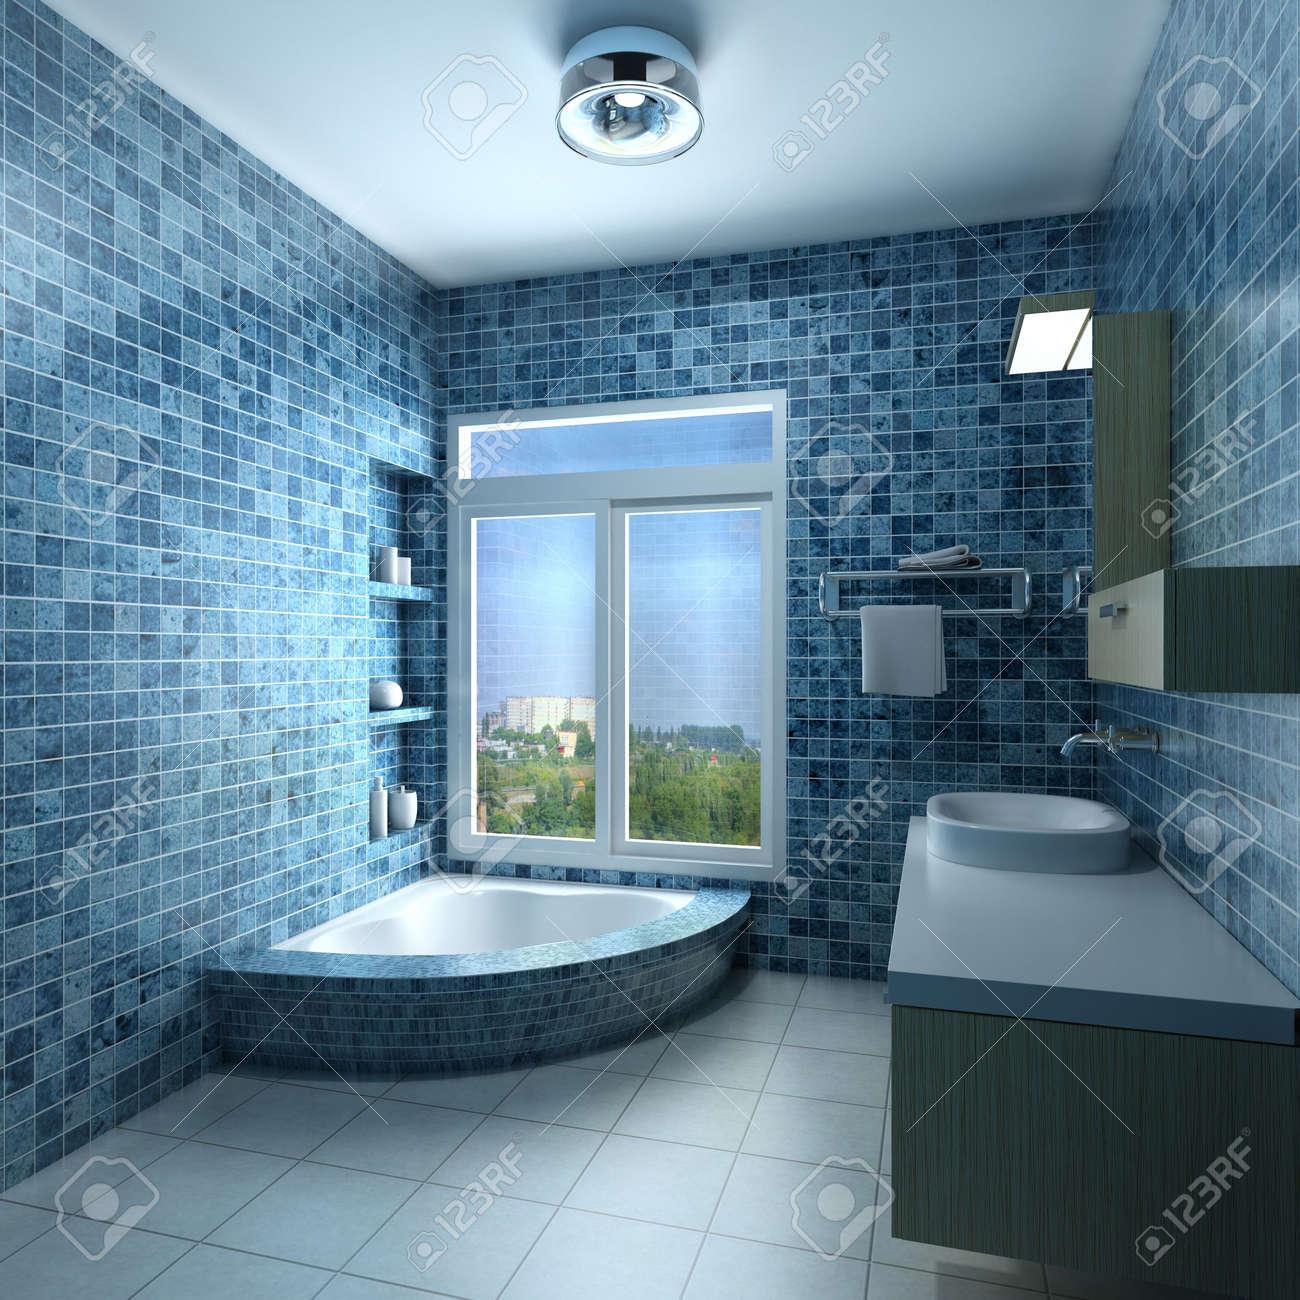 3d-rendering-innenraum ein modernes badezimmer lizenzfreie fotos, Badezimmer ideen